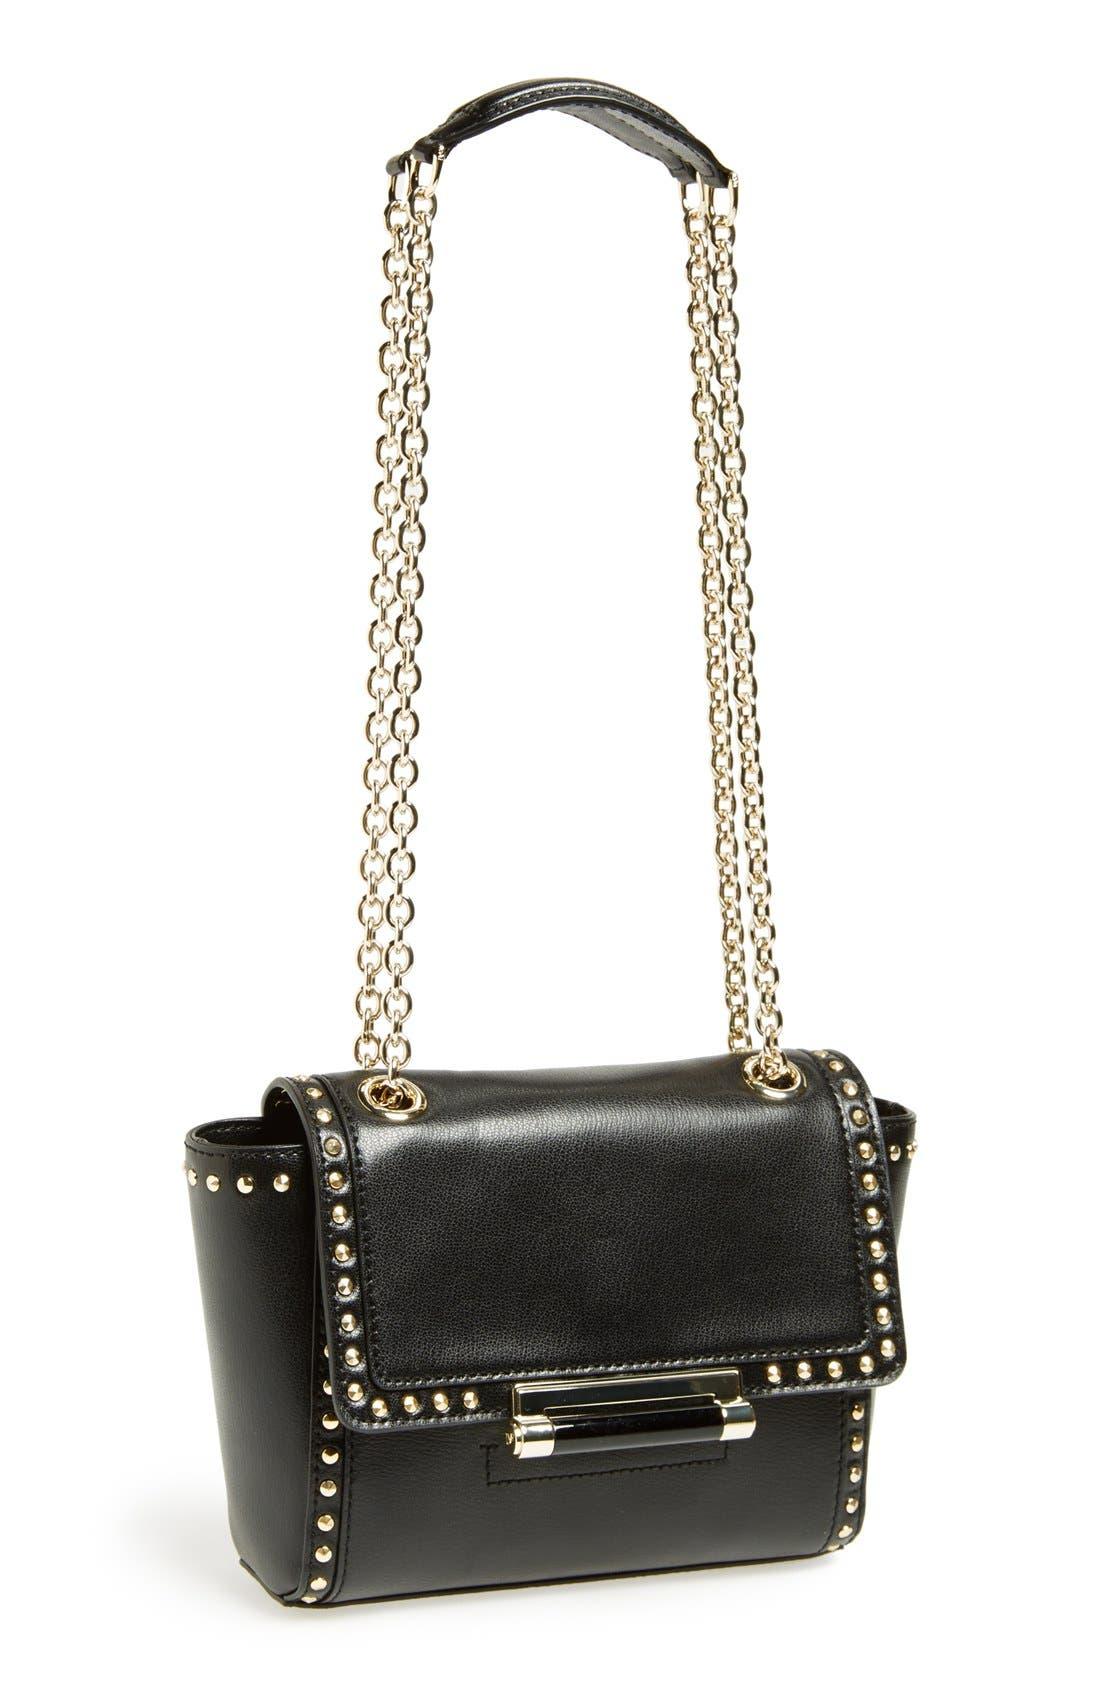 Main Image - Diane Von Furstenberg '440 - Mini' Stud Leather Crossbody Bag